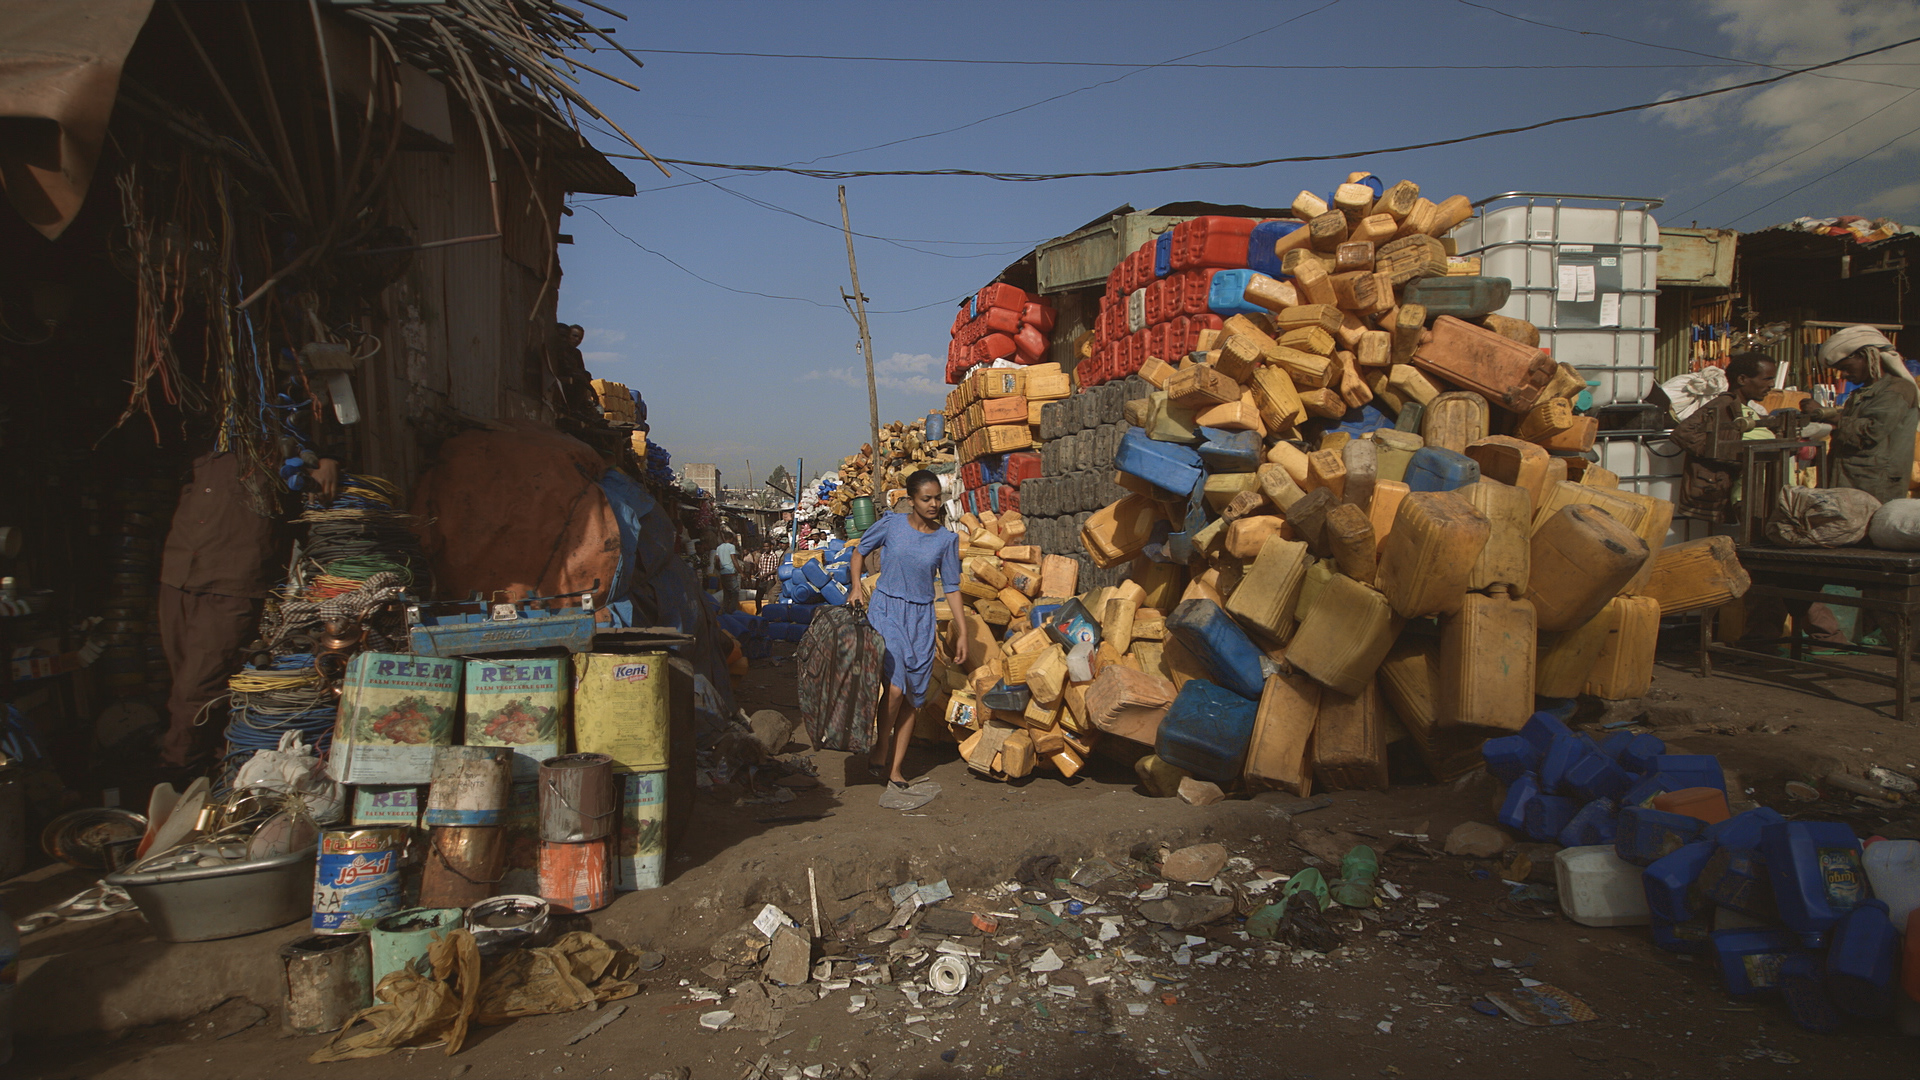 Abeba (2019)